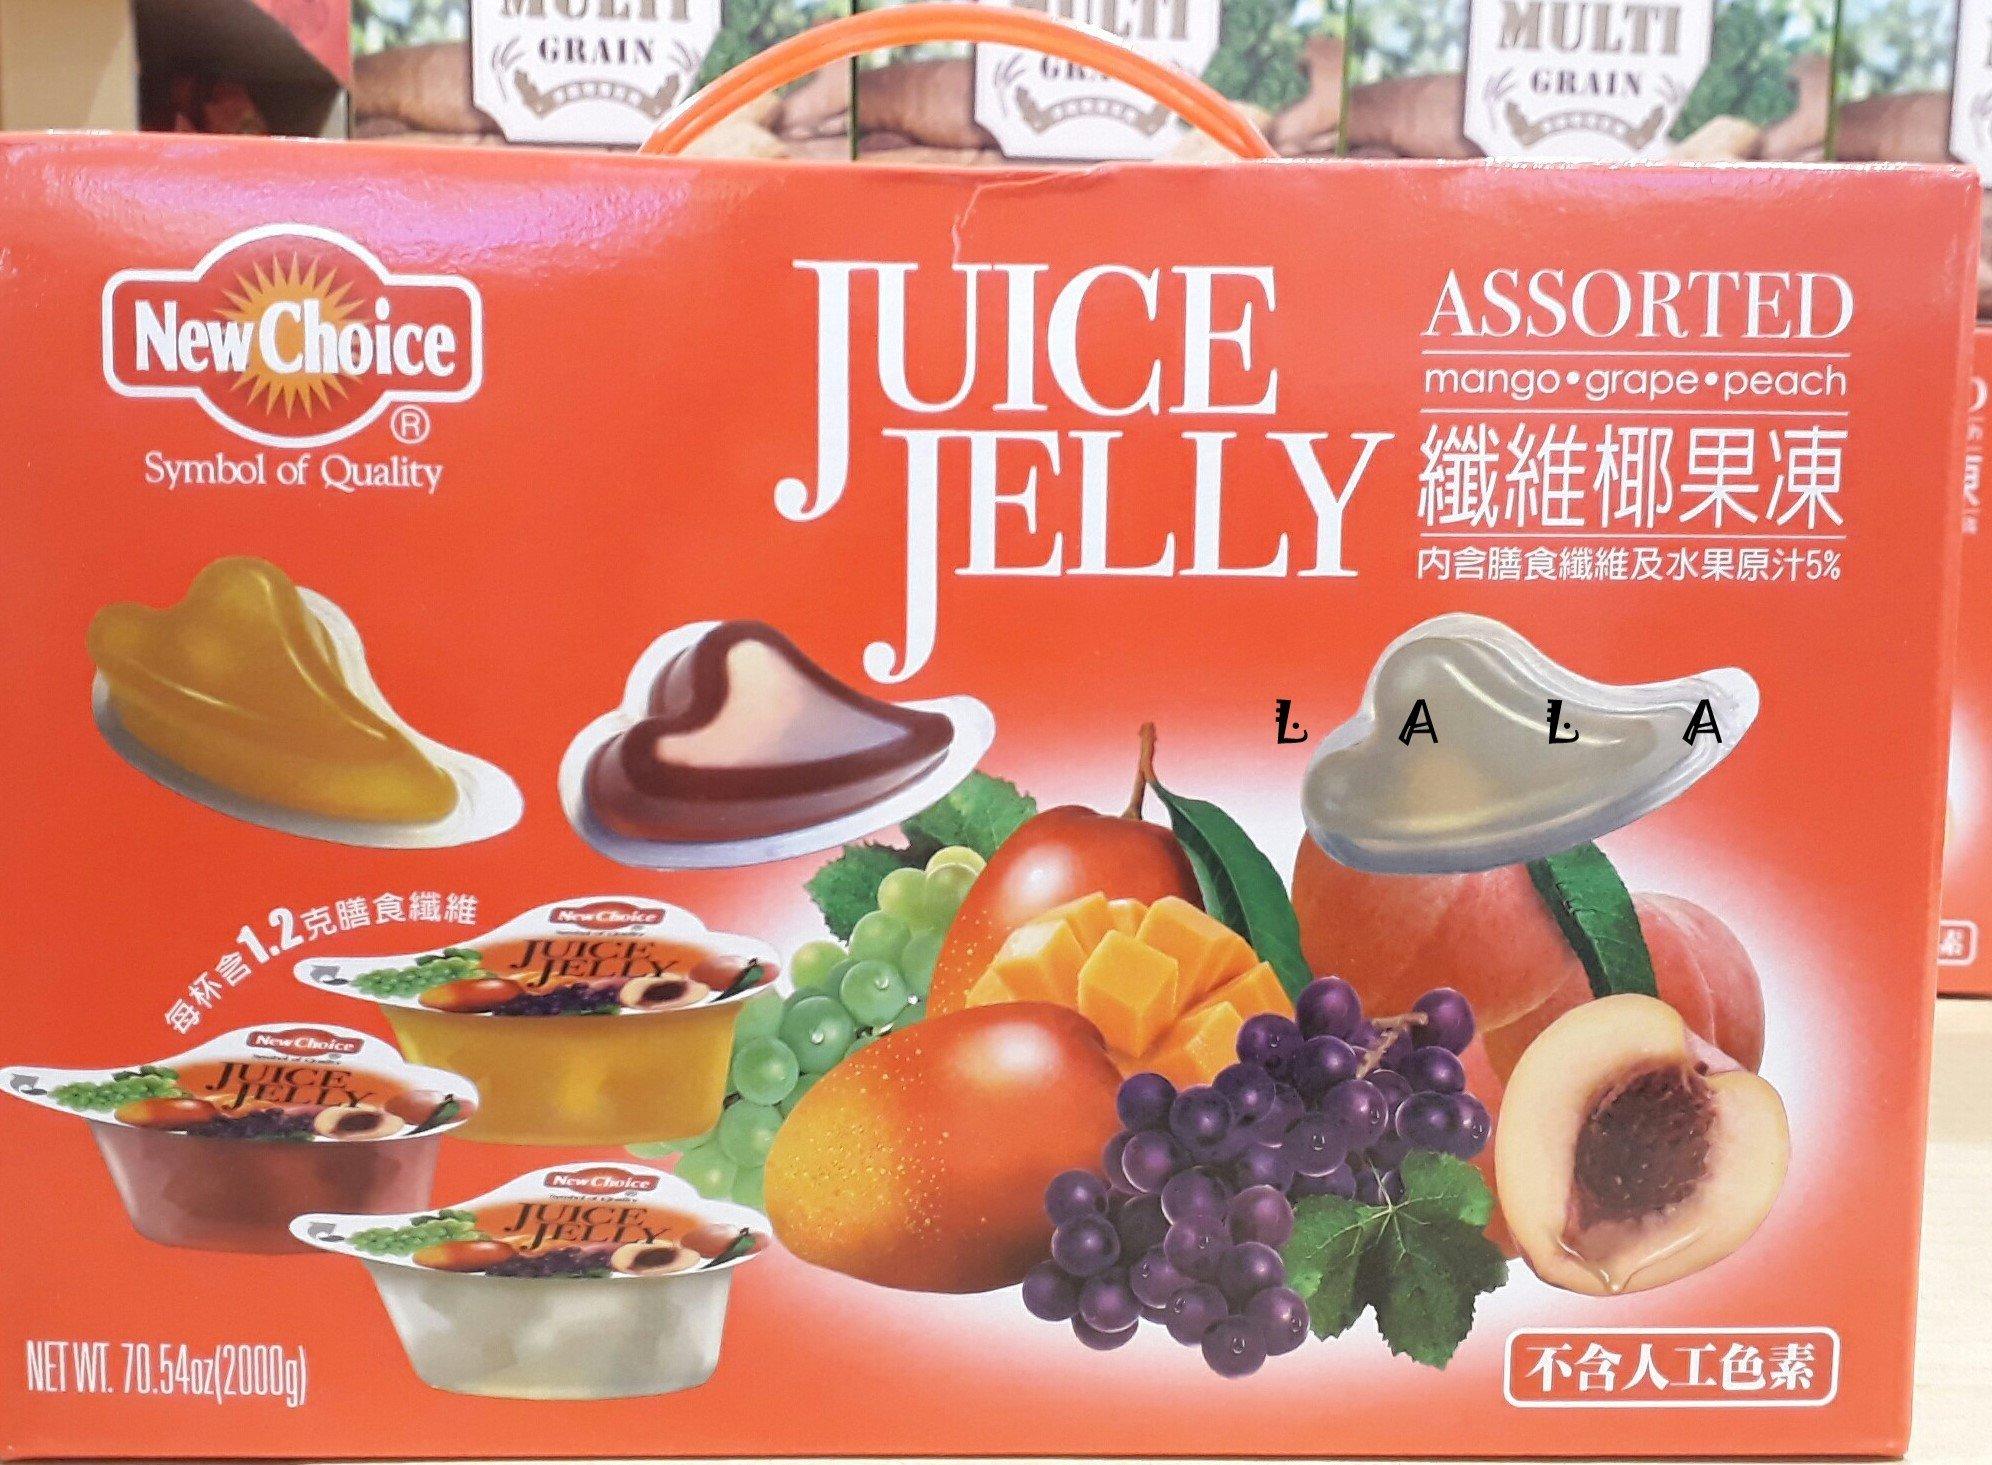 NEW CHOICE 盛香珍 纖維椰果凍 2KG(白桃/芒果/葡萄) Costco 好市多 代購